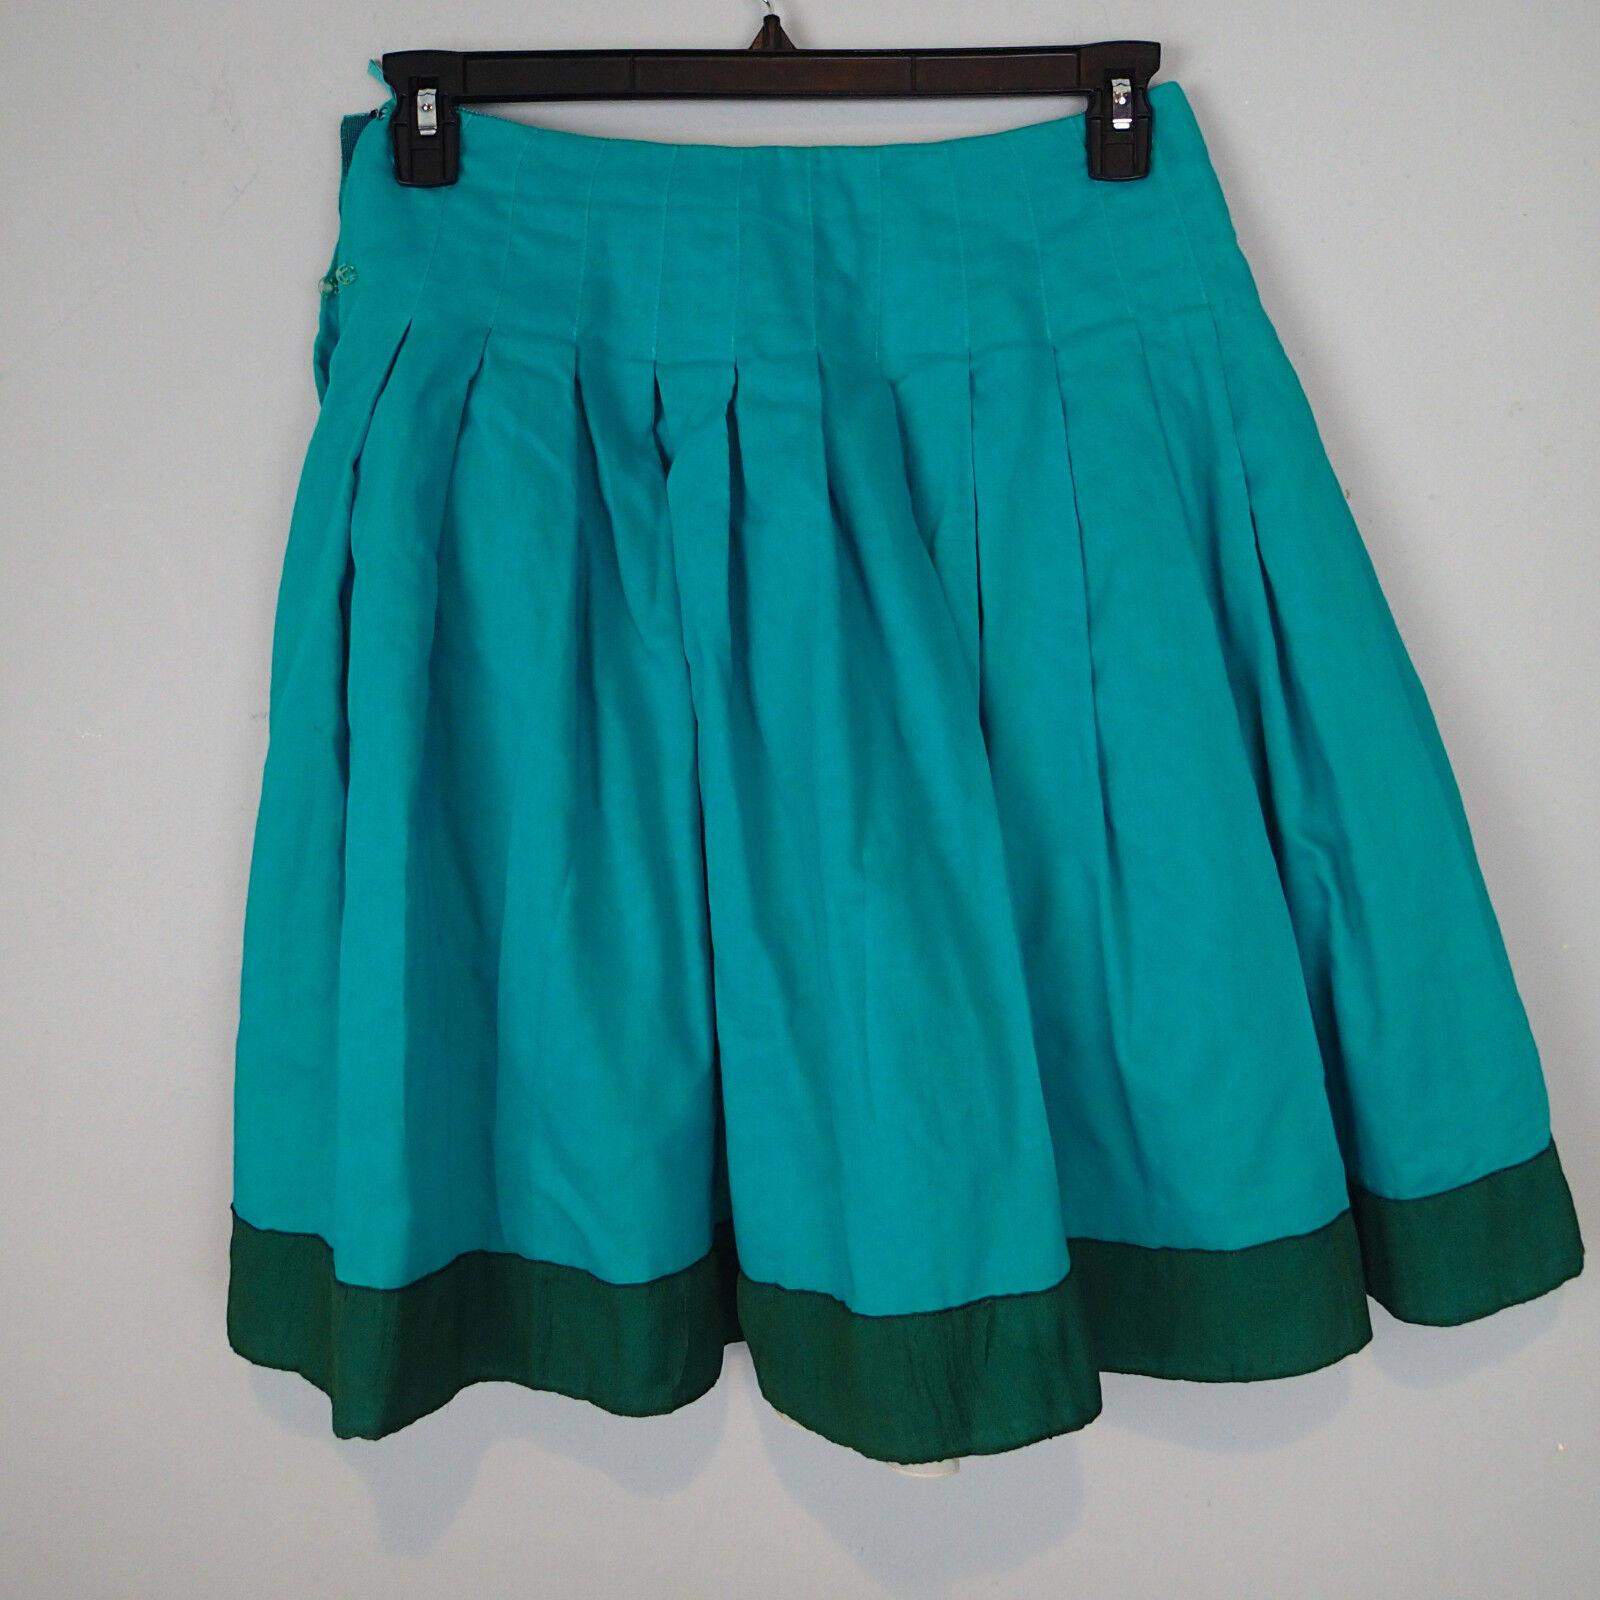 PRADA teal green bluee  Knee Length Pleated  Skirt Size  42  OJ